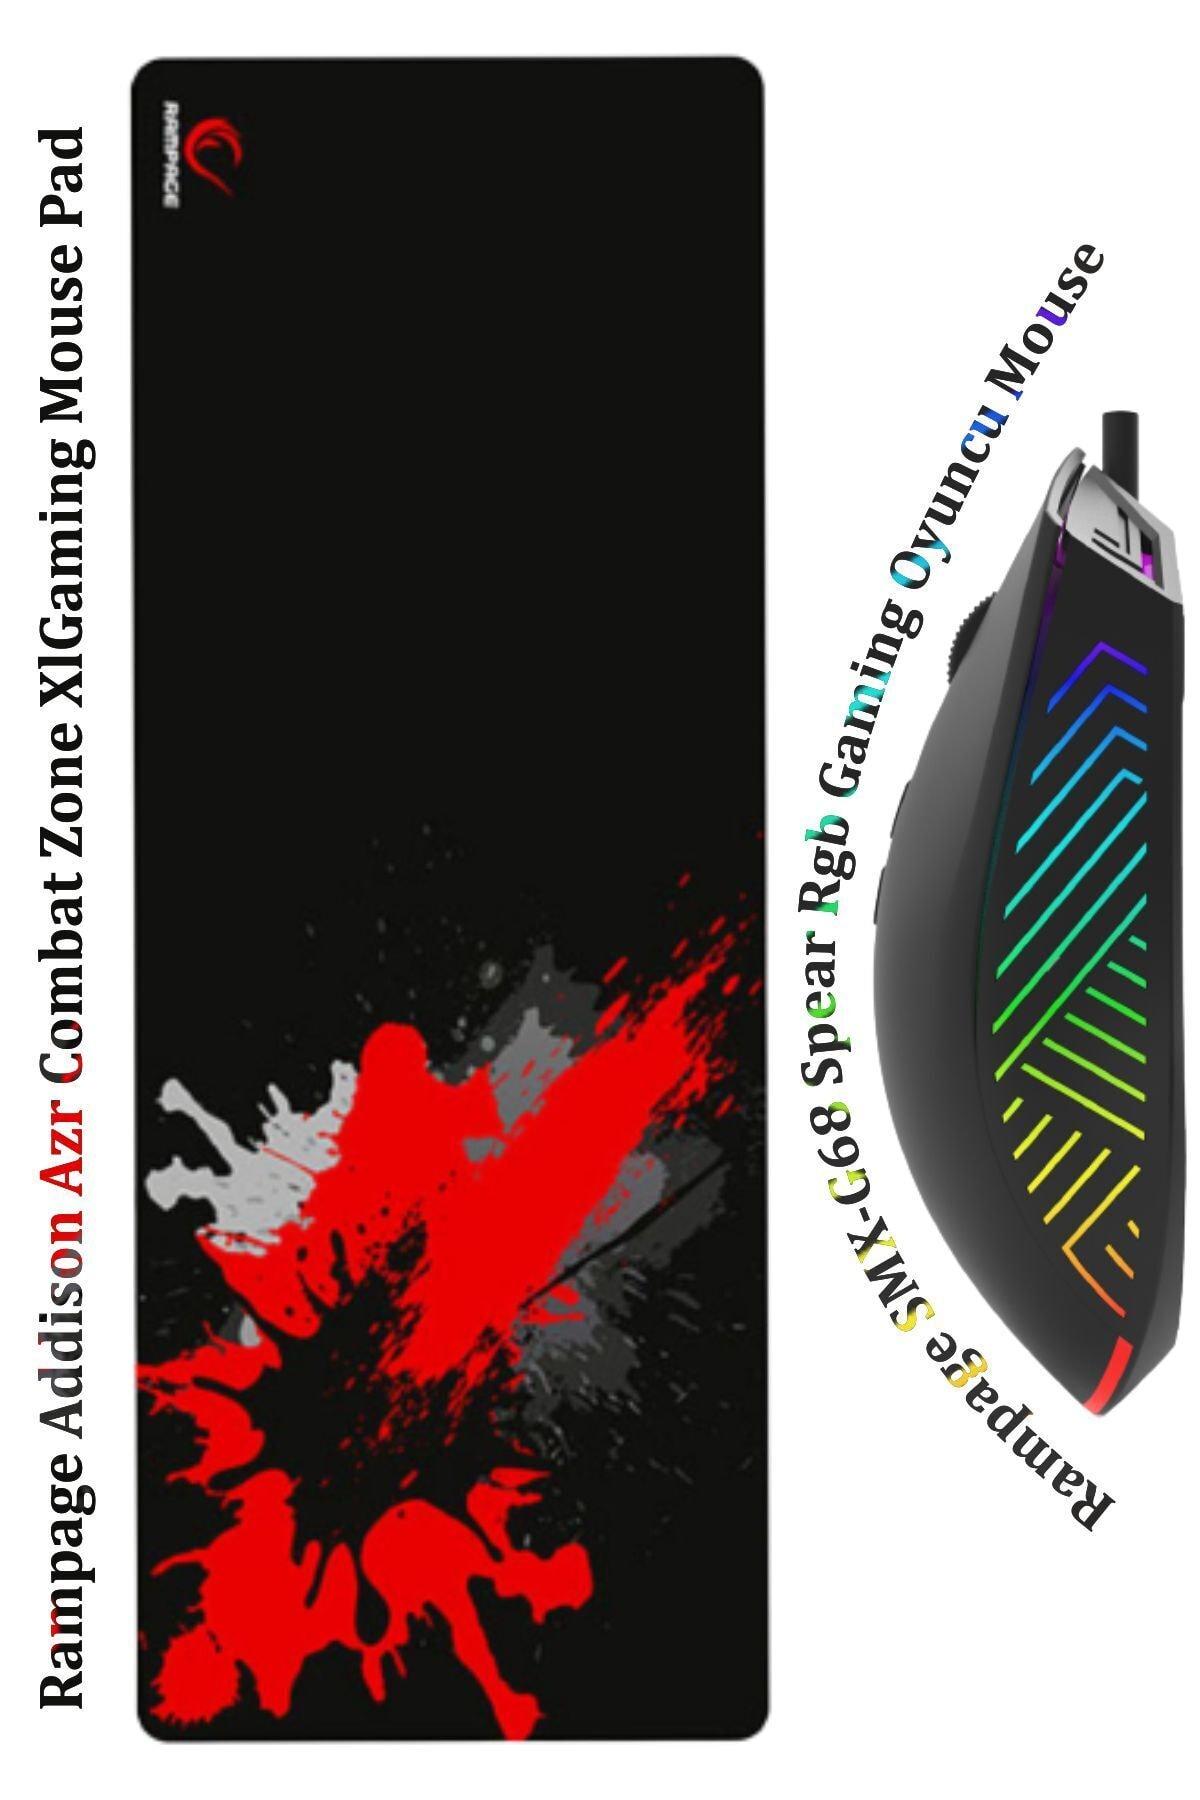 Combat-68 S Gaming Oyuncu Xl 80*30*4 Mousepad Smx-g68 Spear Rgb Ledli Makrolu Mouse